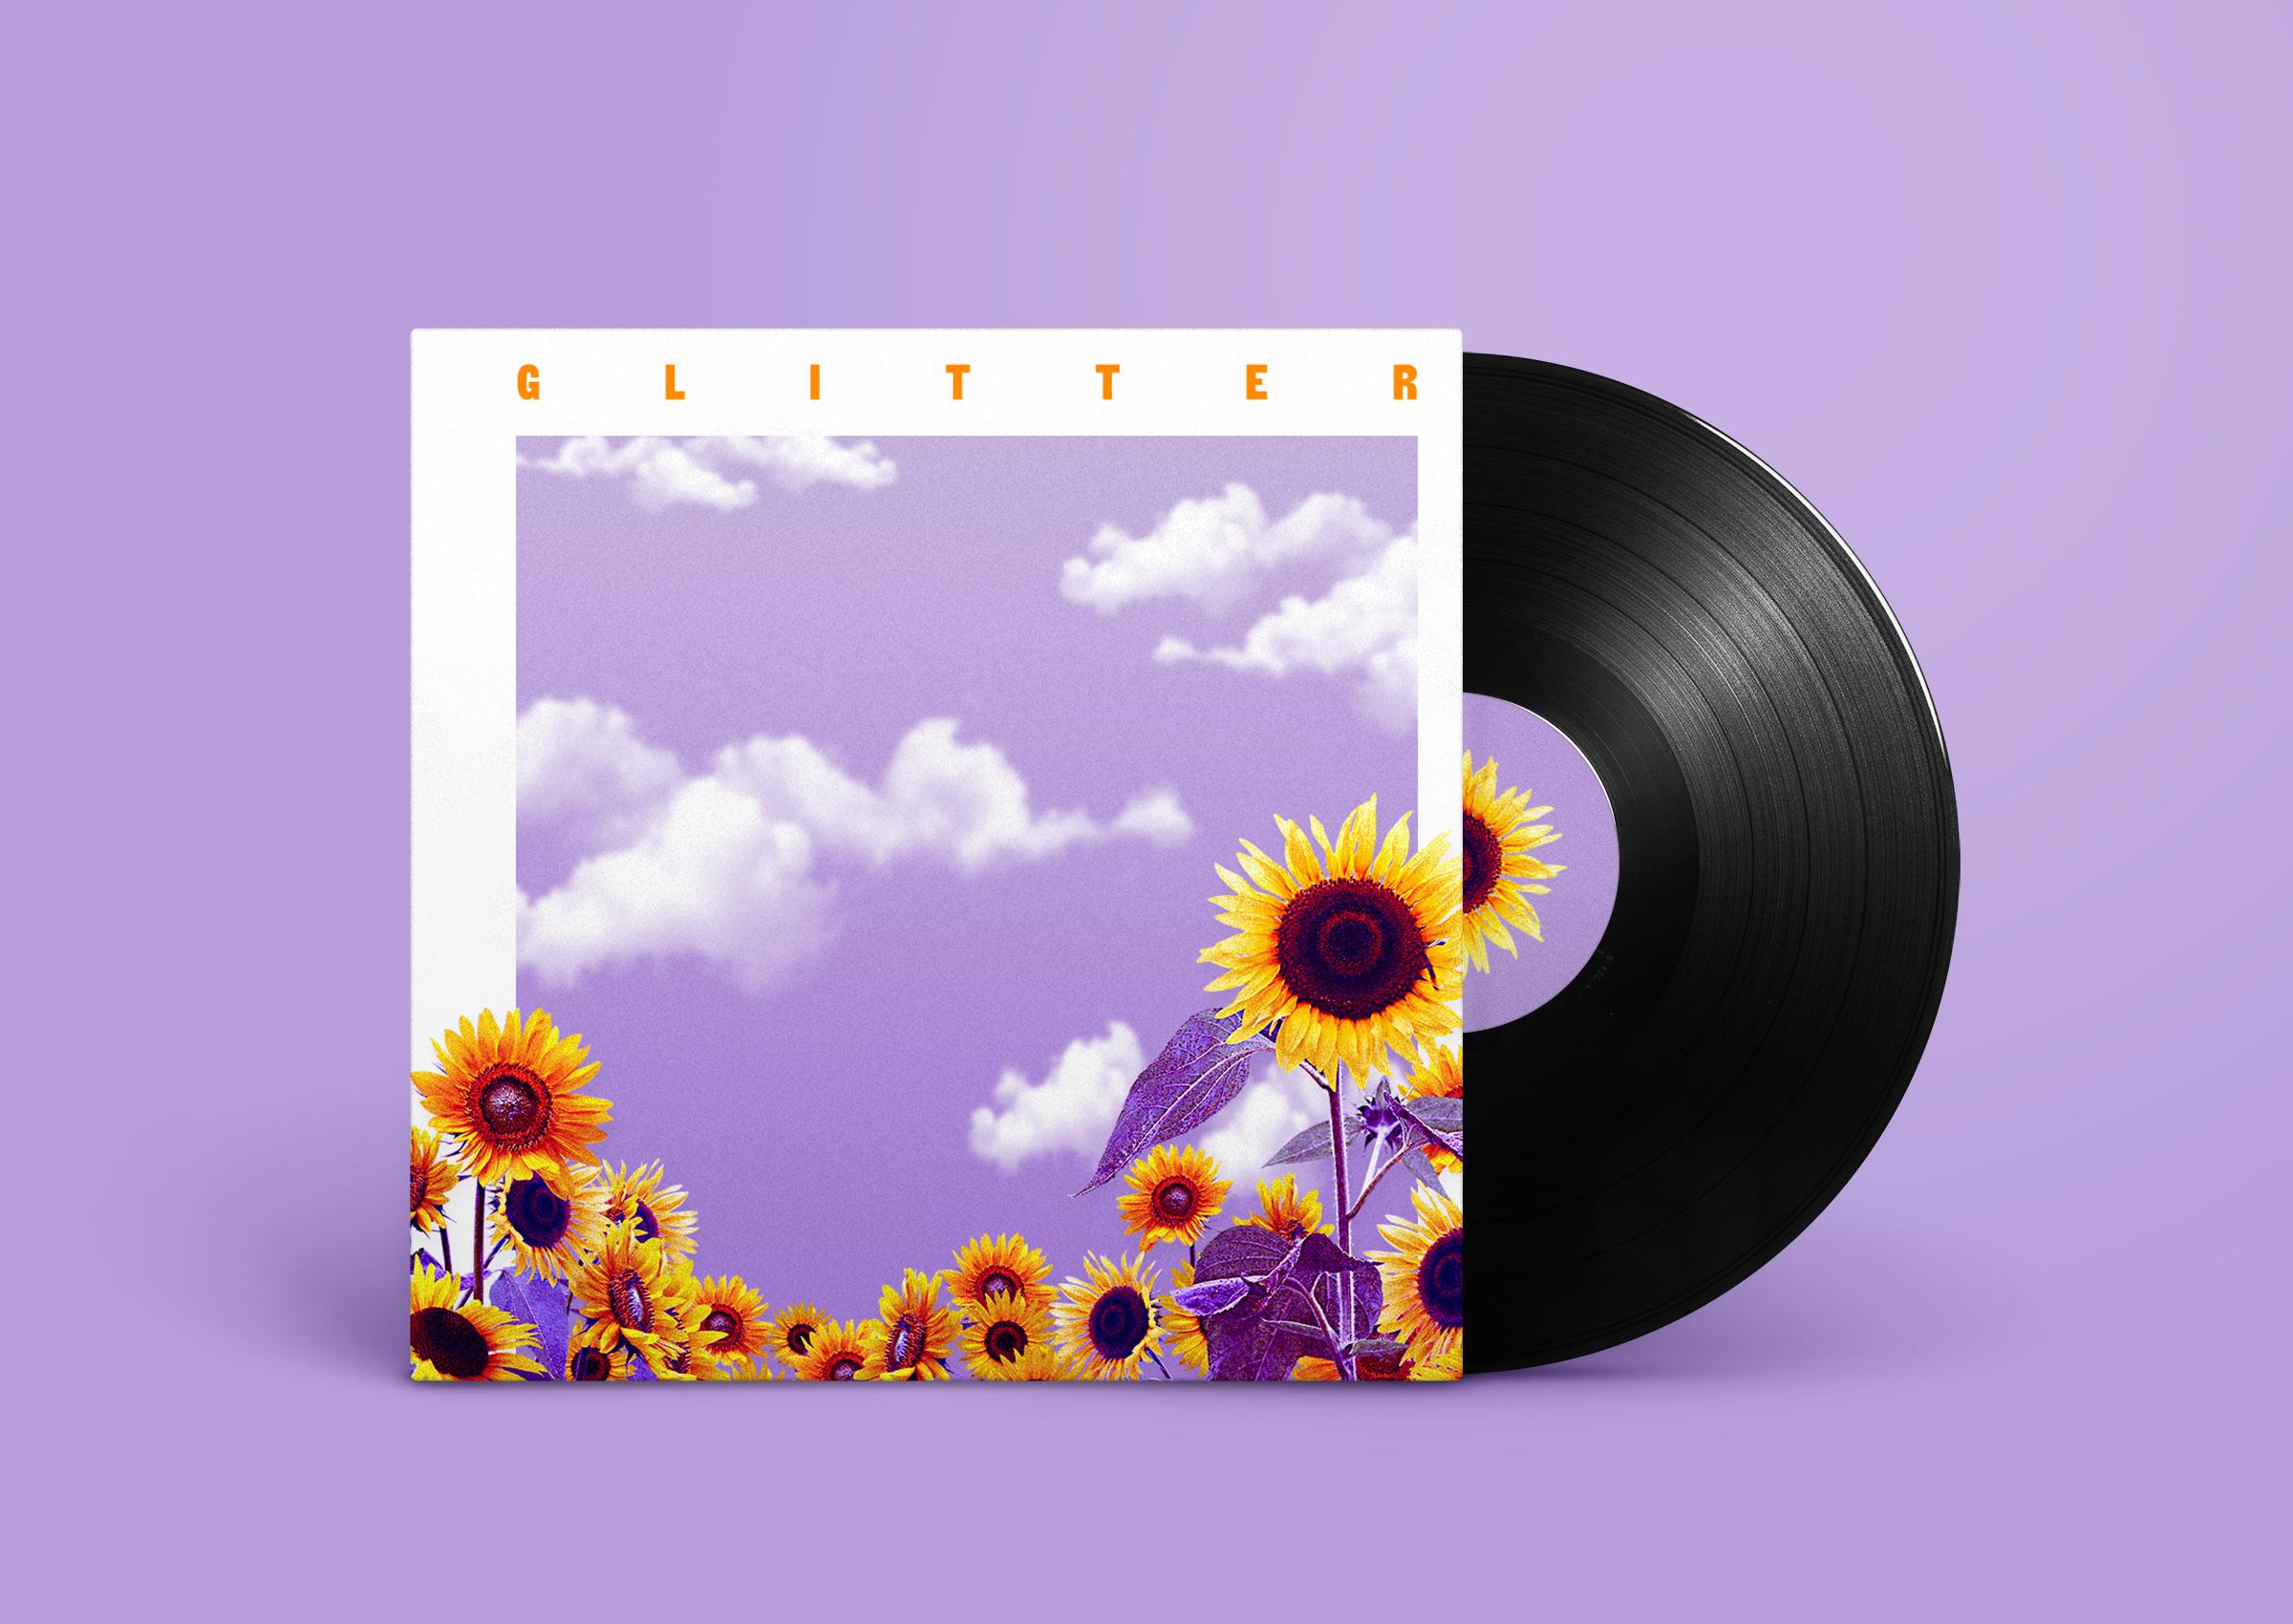 """Glitter"" by Tyler, The Creator | Album: Flower Boy (2017)"